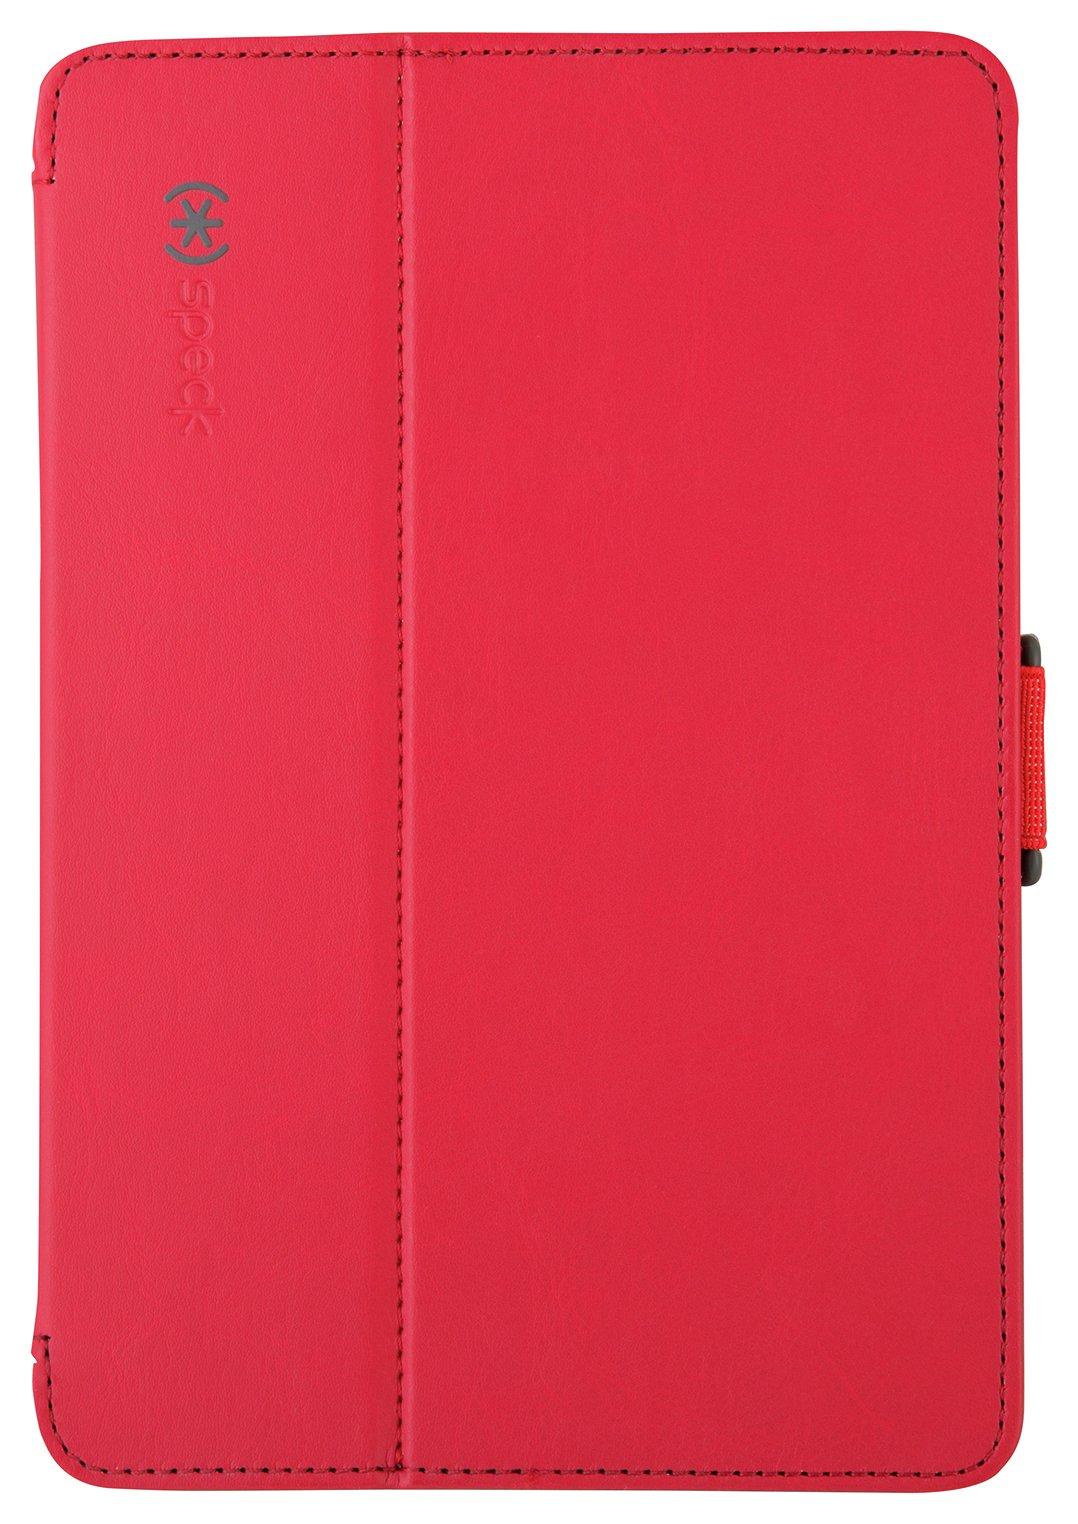 speck-ipad-air-23-folio-case-poppy-redgrey